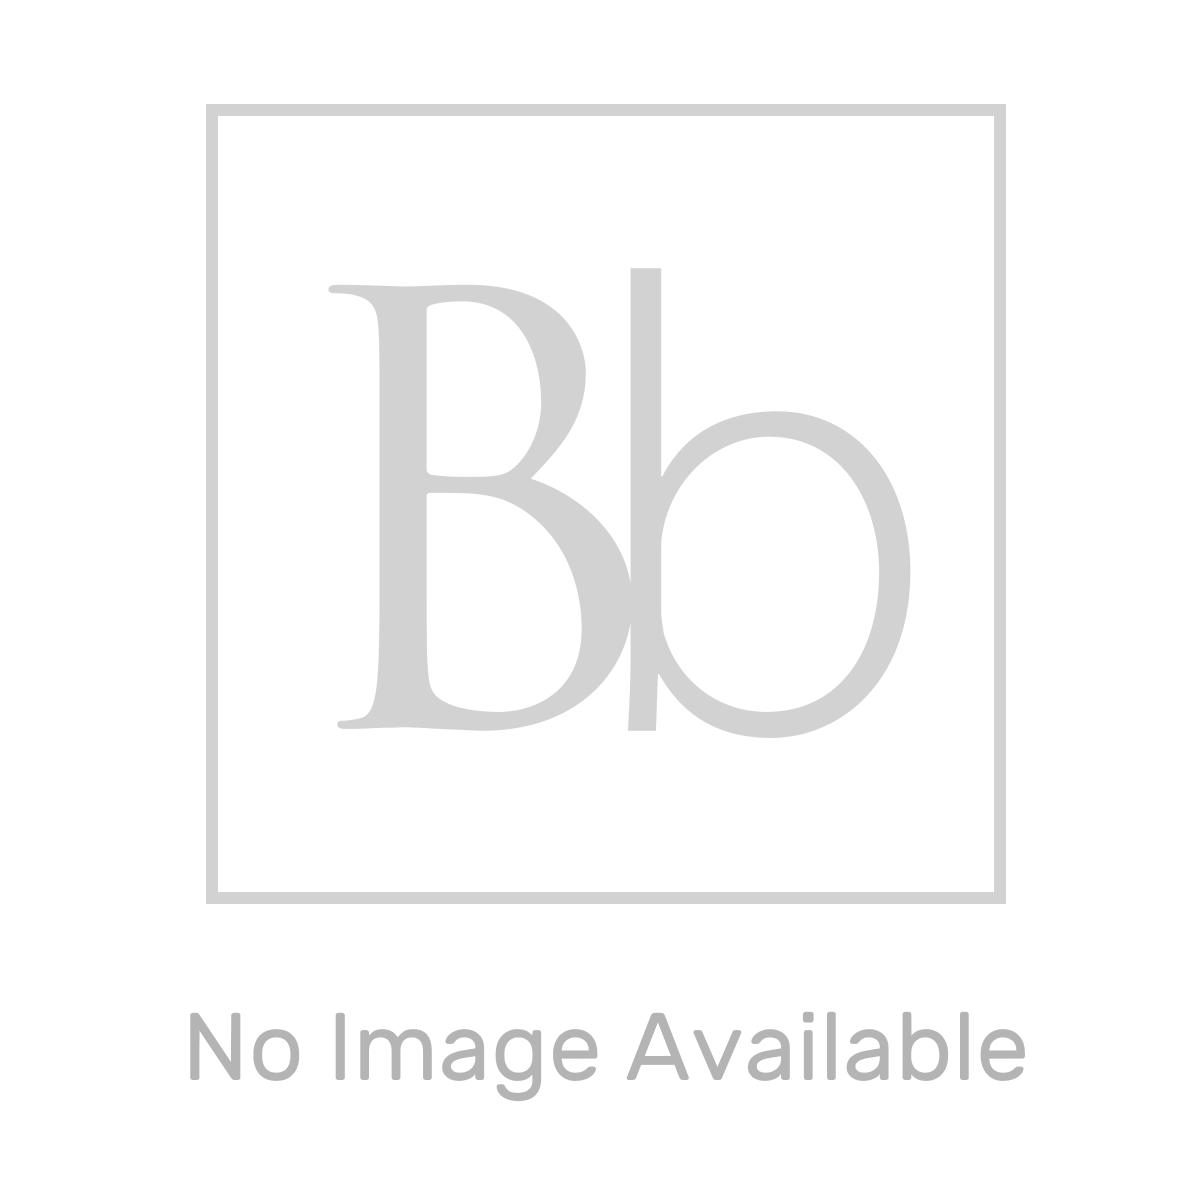 Moods Plain White Deluxe Acrylic Bath End Panel 800mm